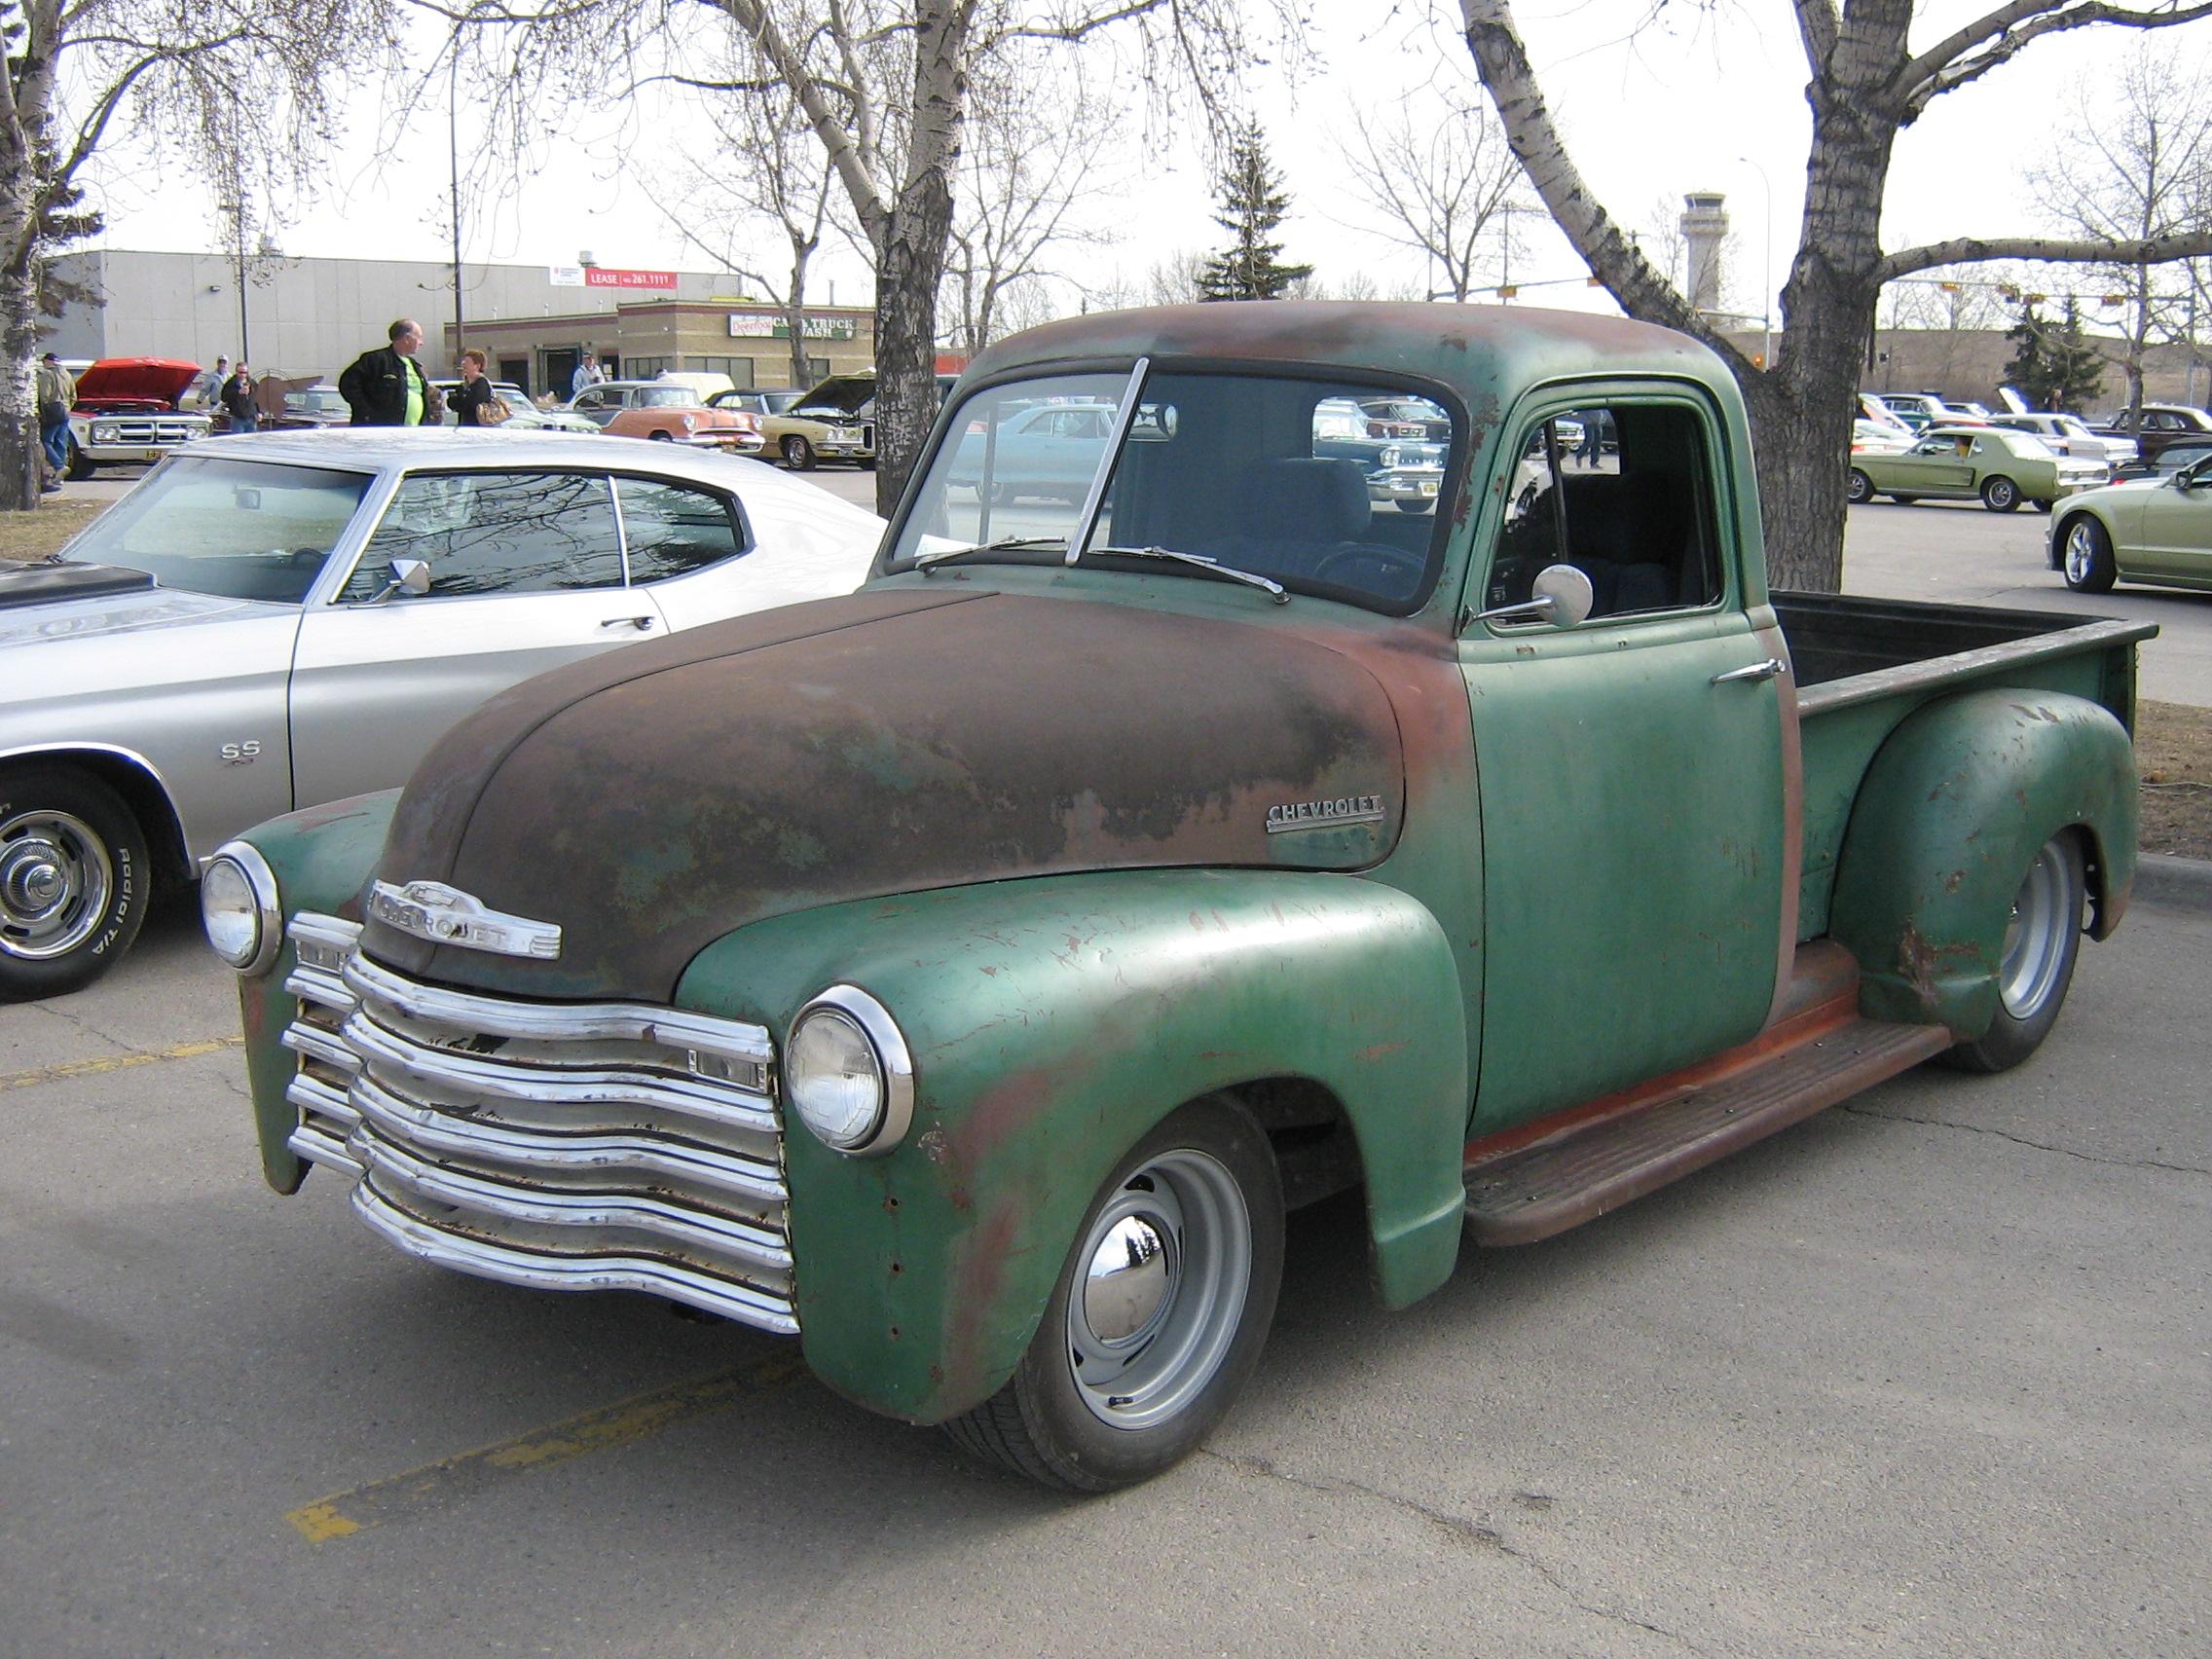 10 chevrolet chevy trucks for sale old trucks 57 chevy trucks for sale